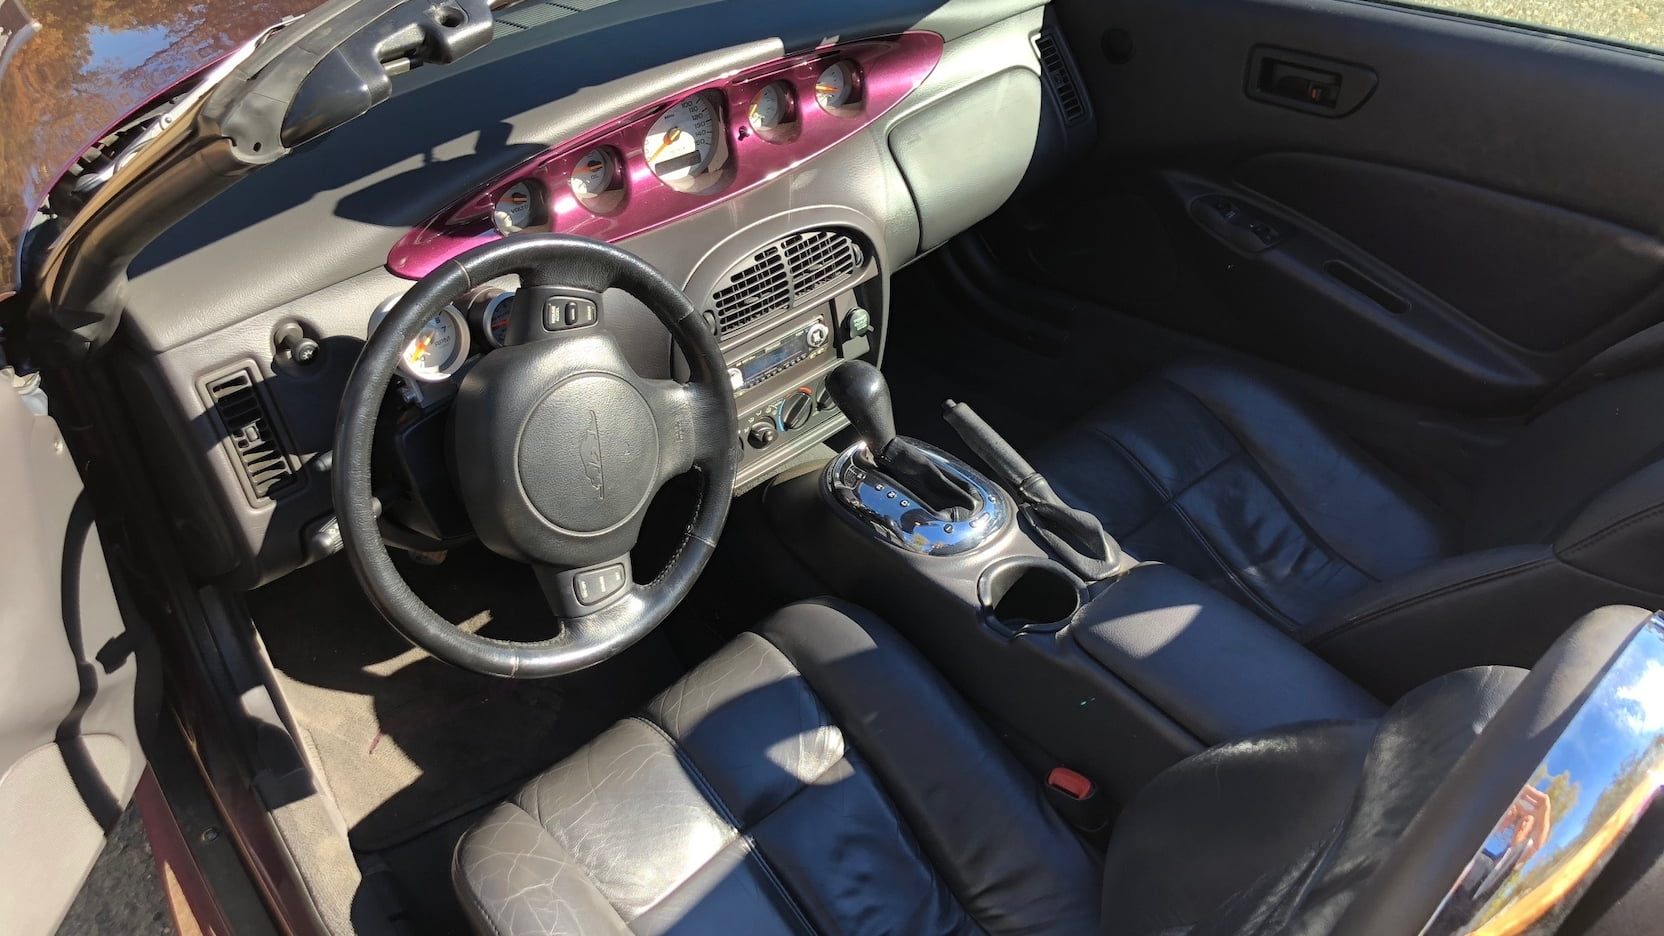 1999 Plymouth Prowler interior